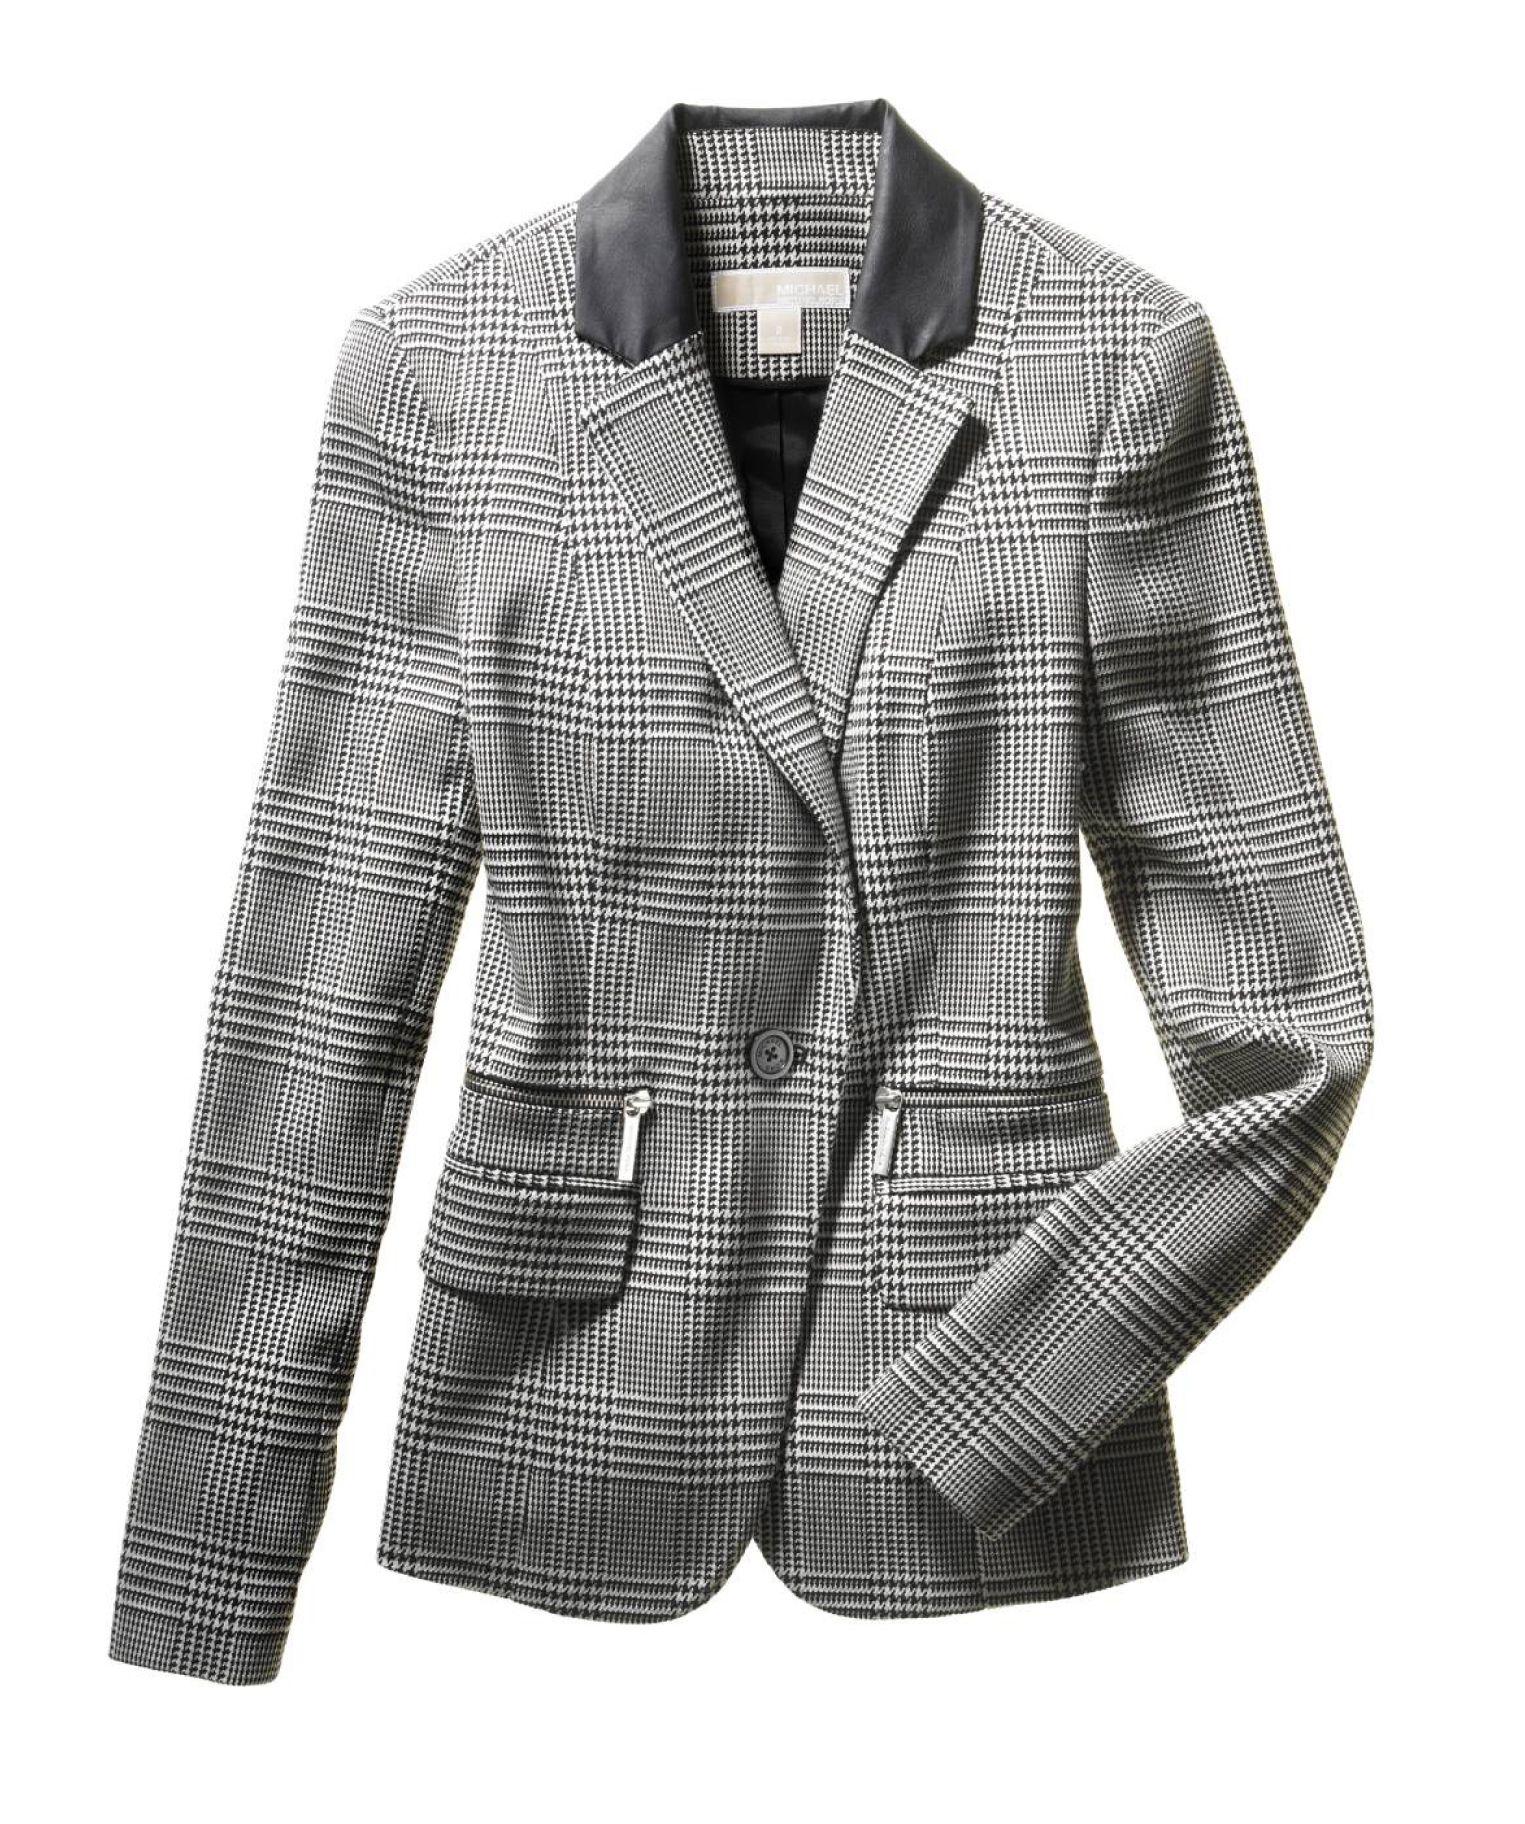 Pin & Win! Smart investment. #MichaelKors #jacket #plaid #hotlist #macysfallstyle BUY NOW!